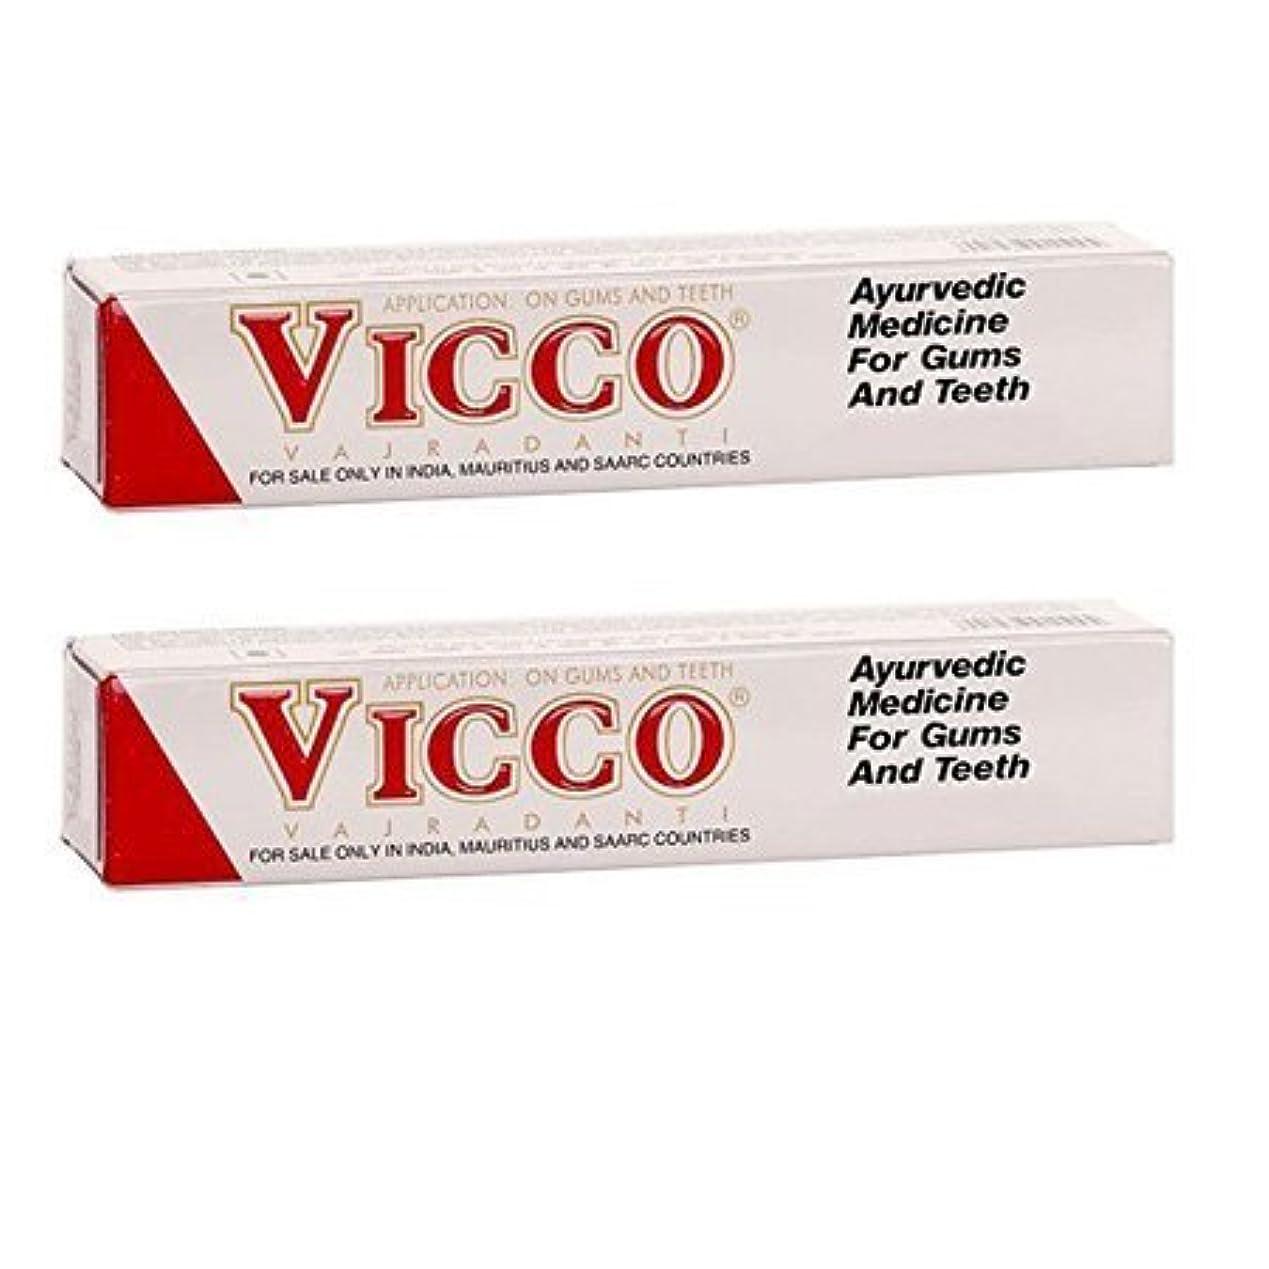 致命的精算自動的にBuycrafty Ayurvedic Herbal Toothpaste 100gm (Pack of 2) Vicco vajradanti Free 2 Dental Floss Toothpicks